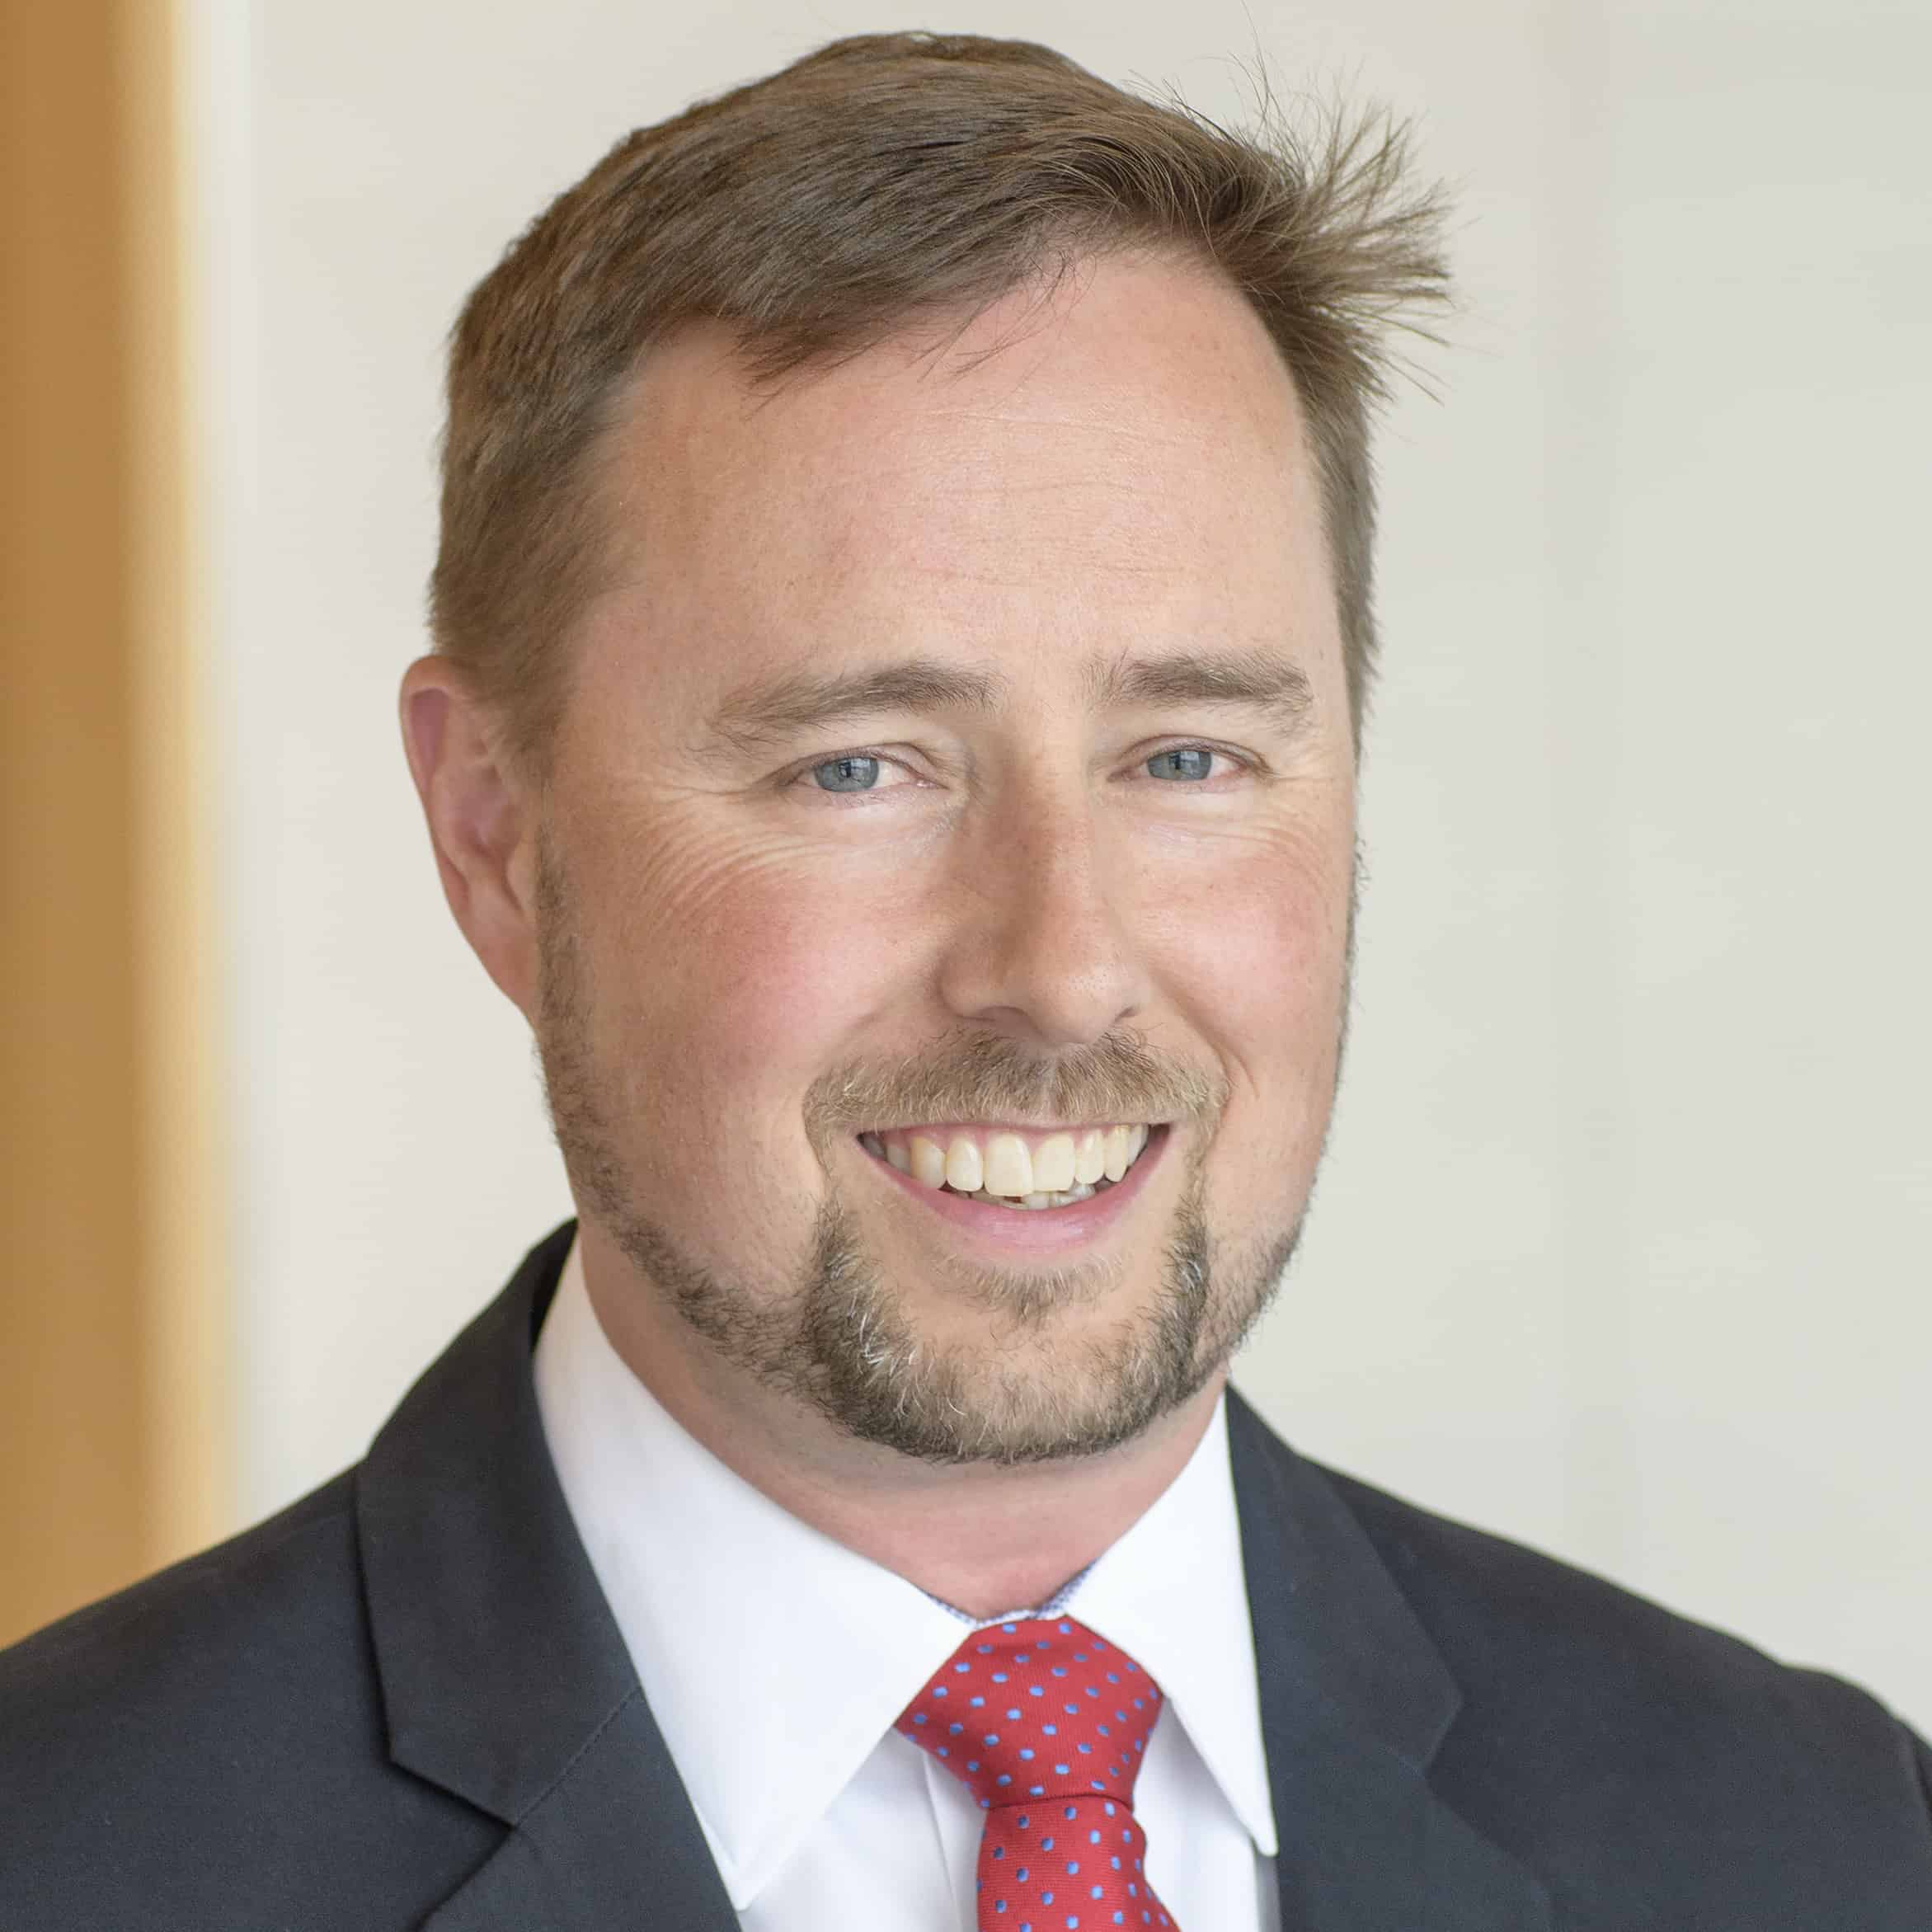 Ian D. Heine